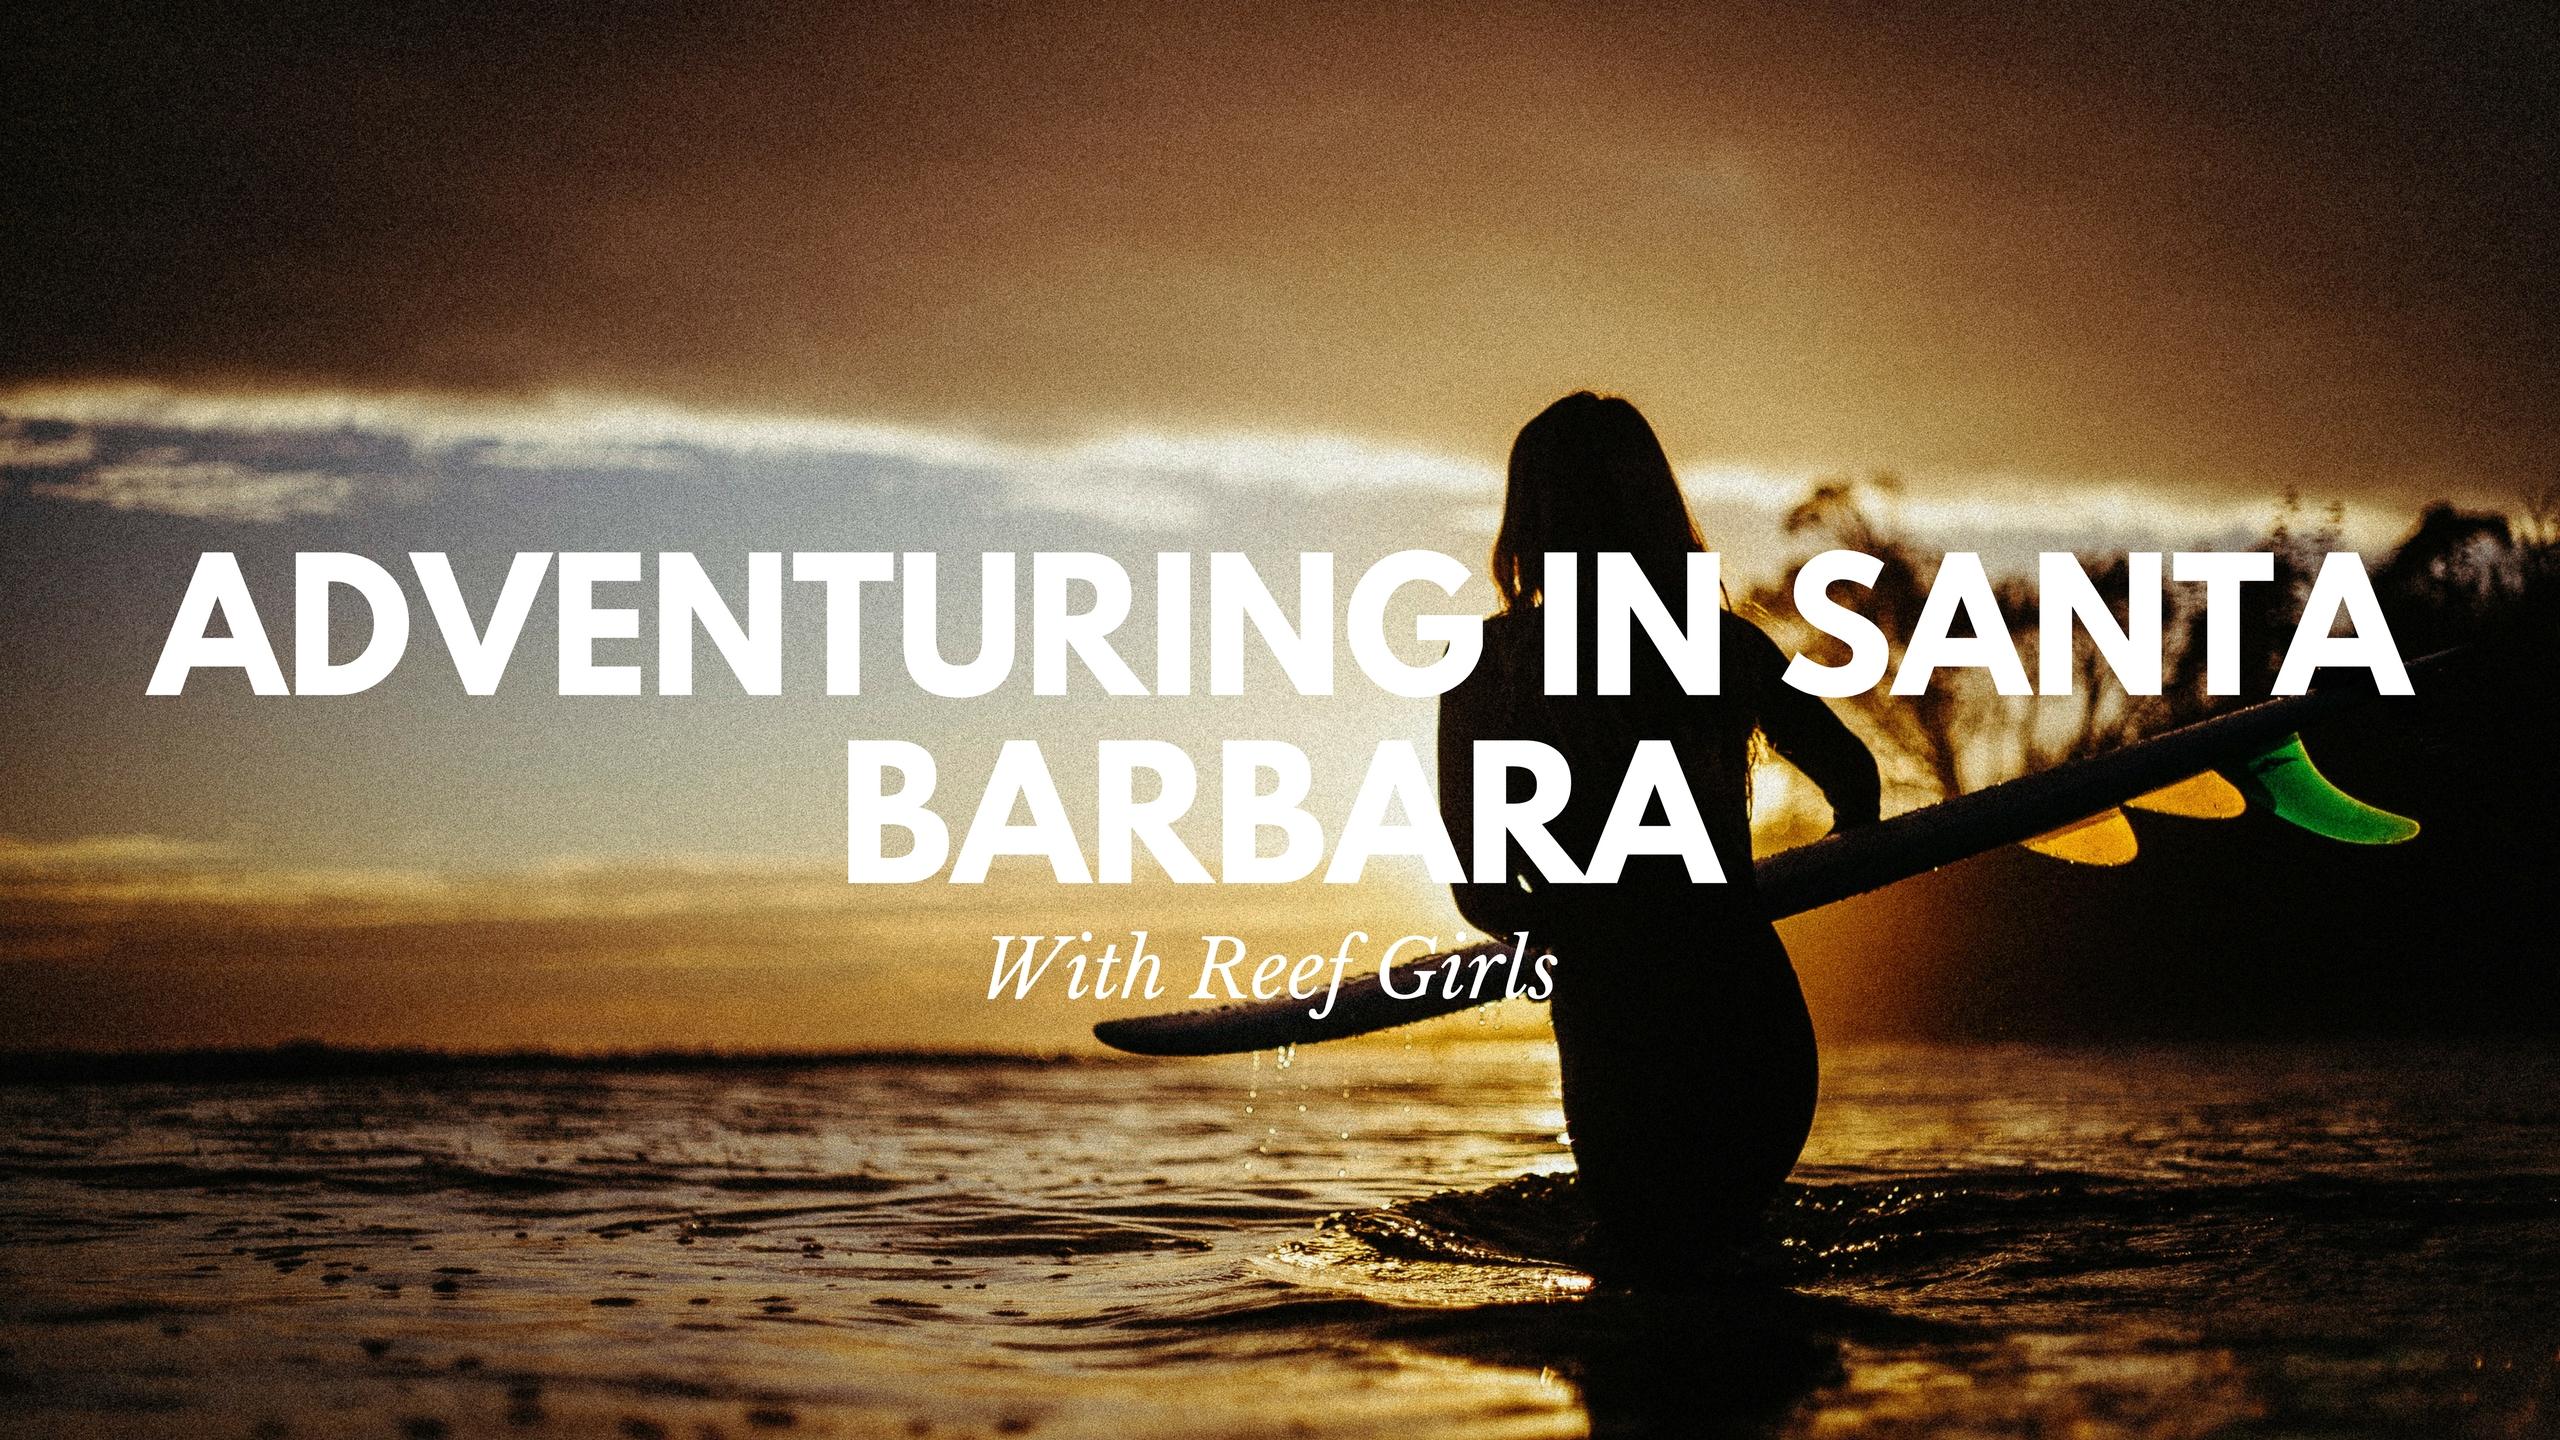 Adventuring in Santa Barbara